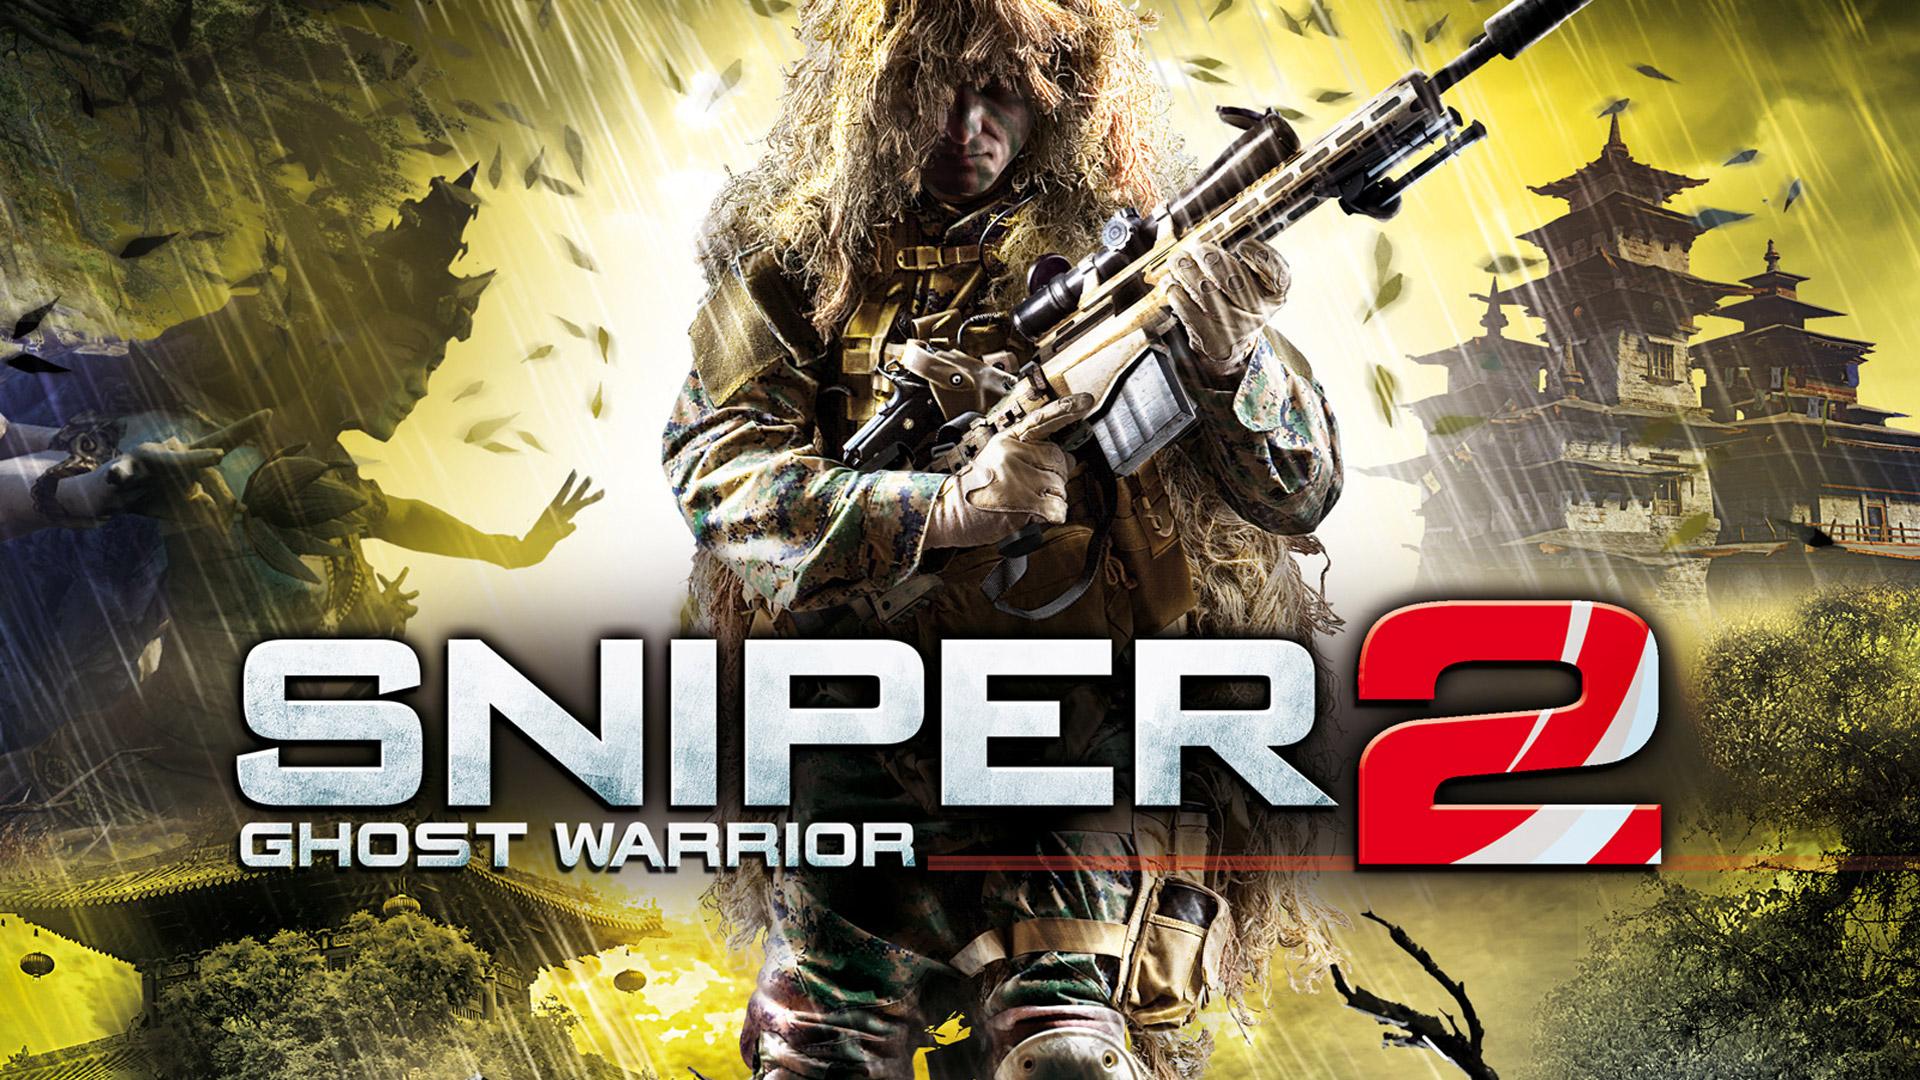 Free Sniper: Ghost Warrior 2 Wallpaper in 1920x1080